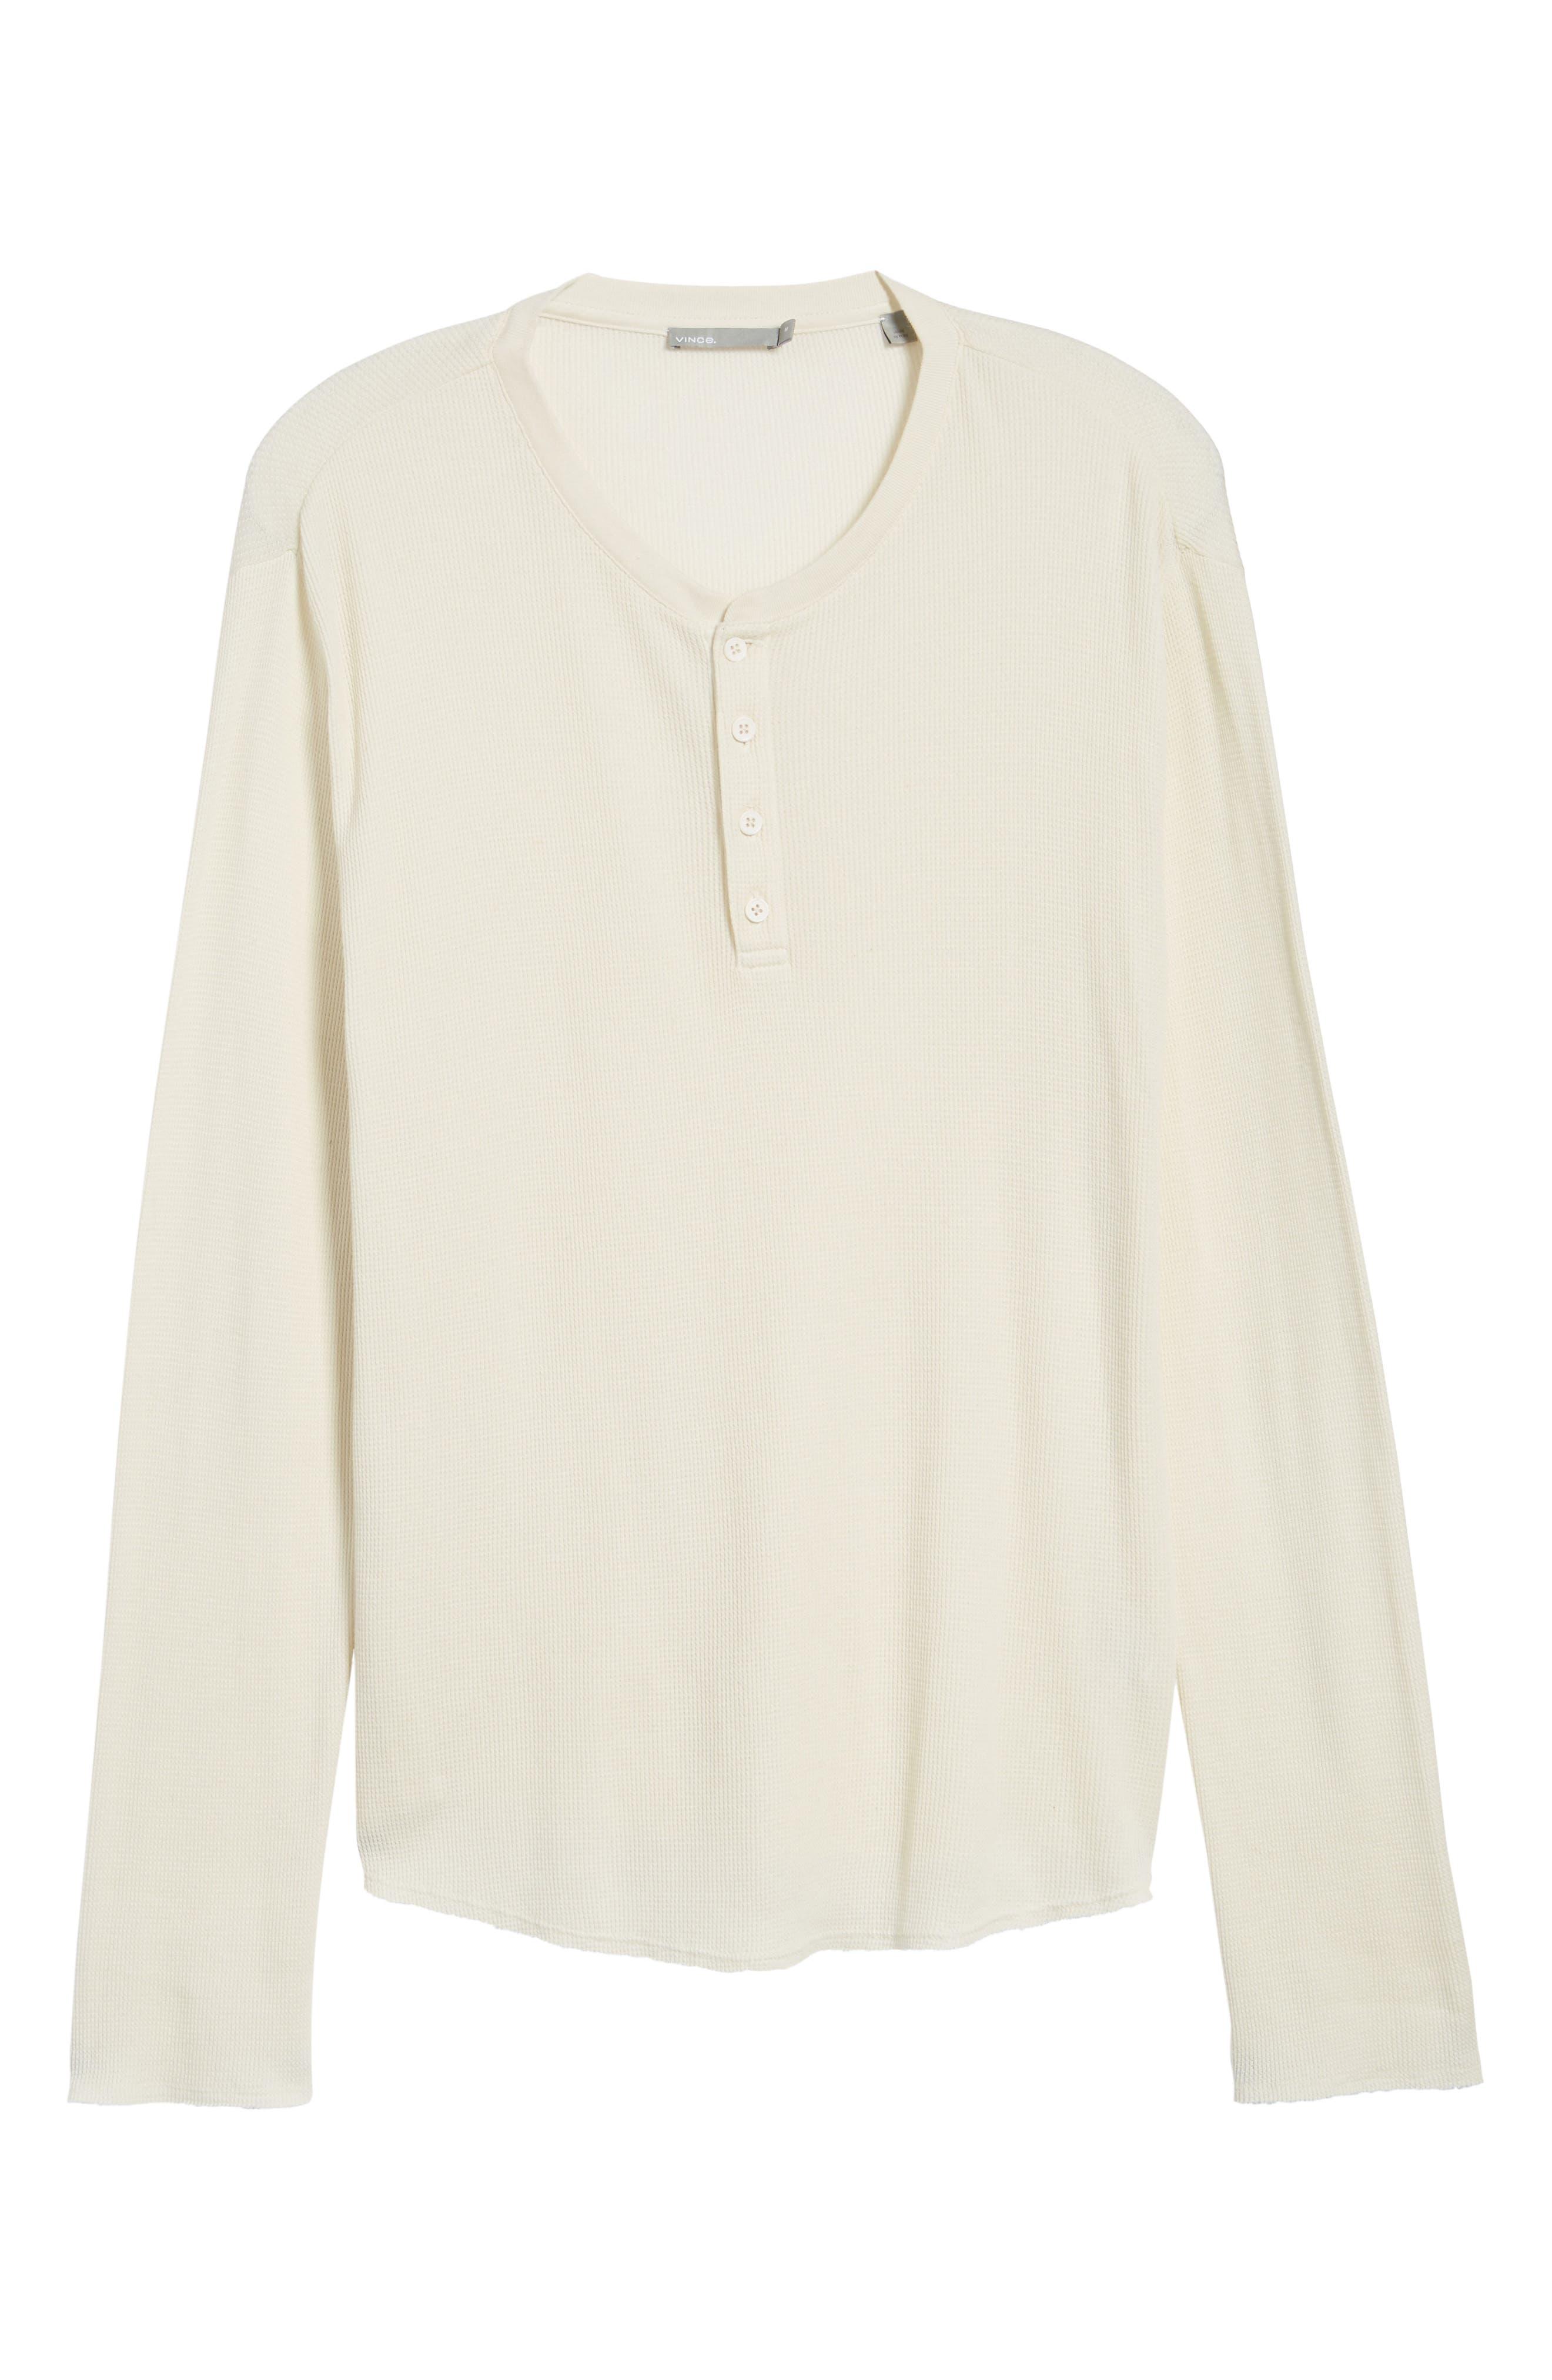 Thermal Knit Long Sleeve Henley T-Shirt,                             Alternate thumbnail 6, color,                             101